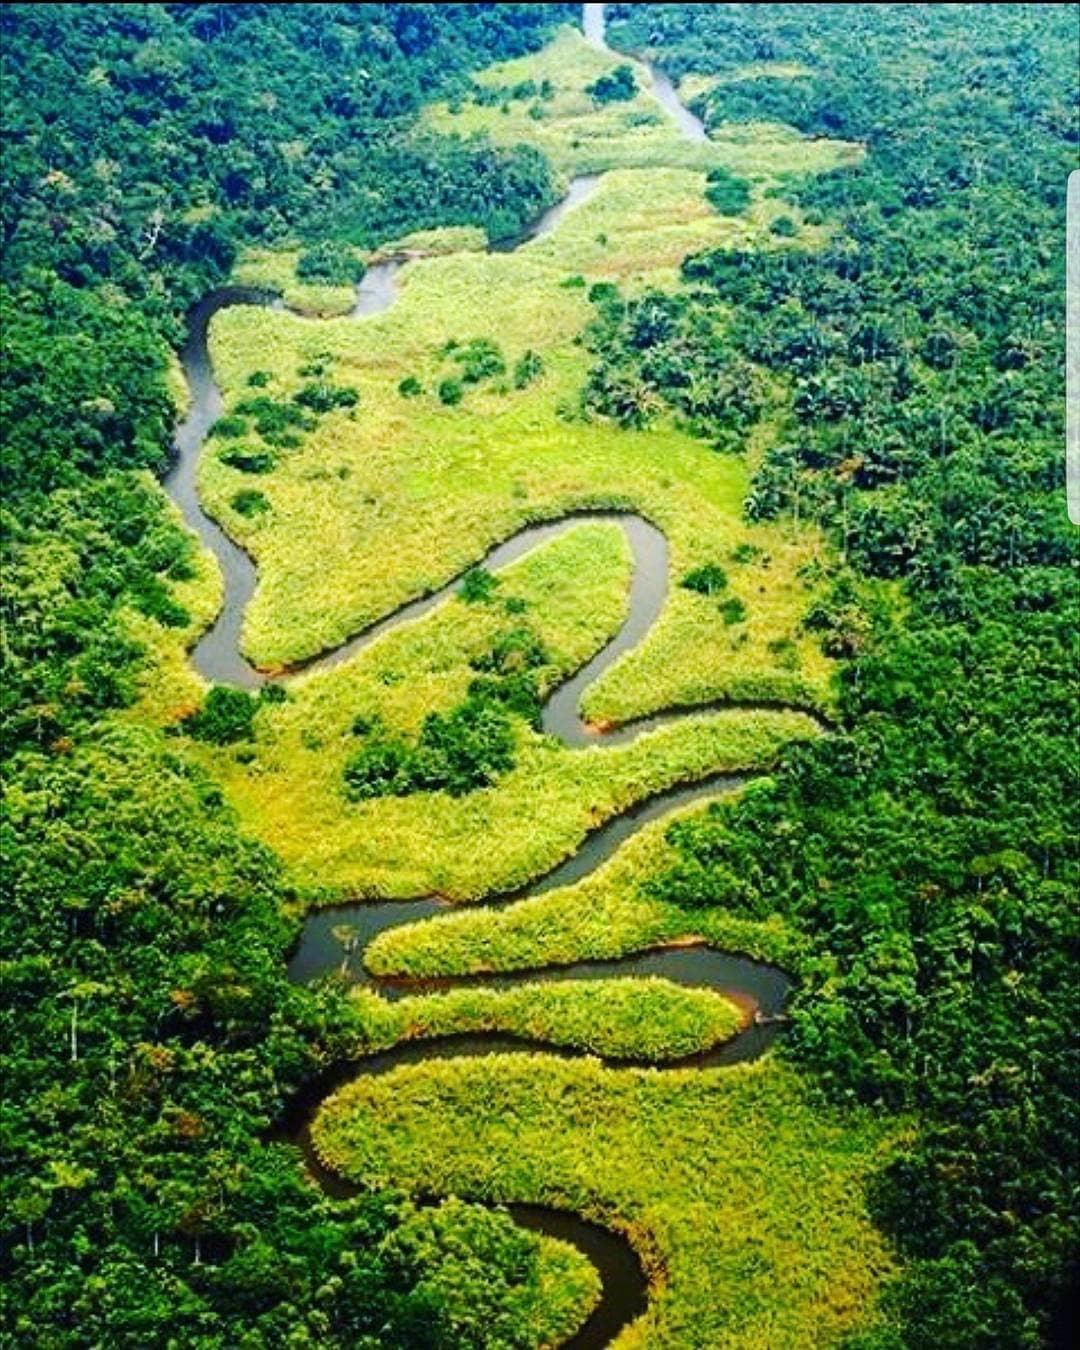 Congo River, Africa